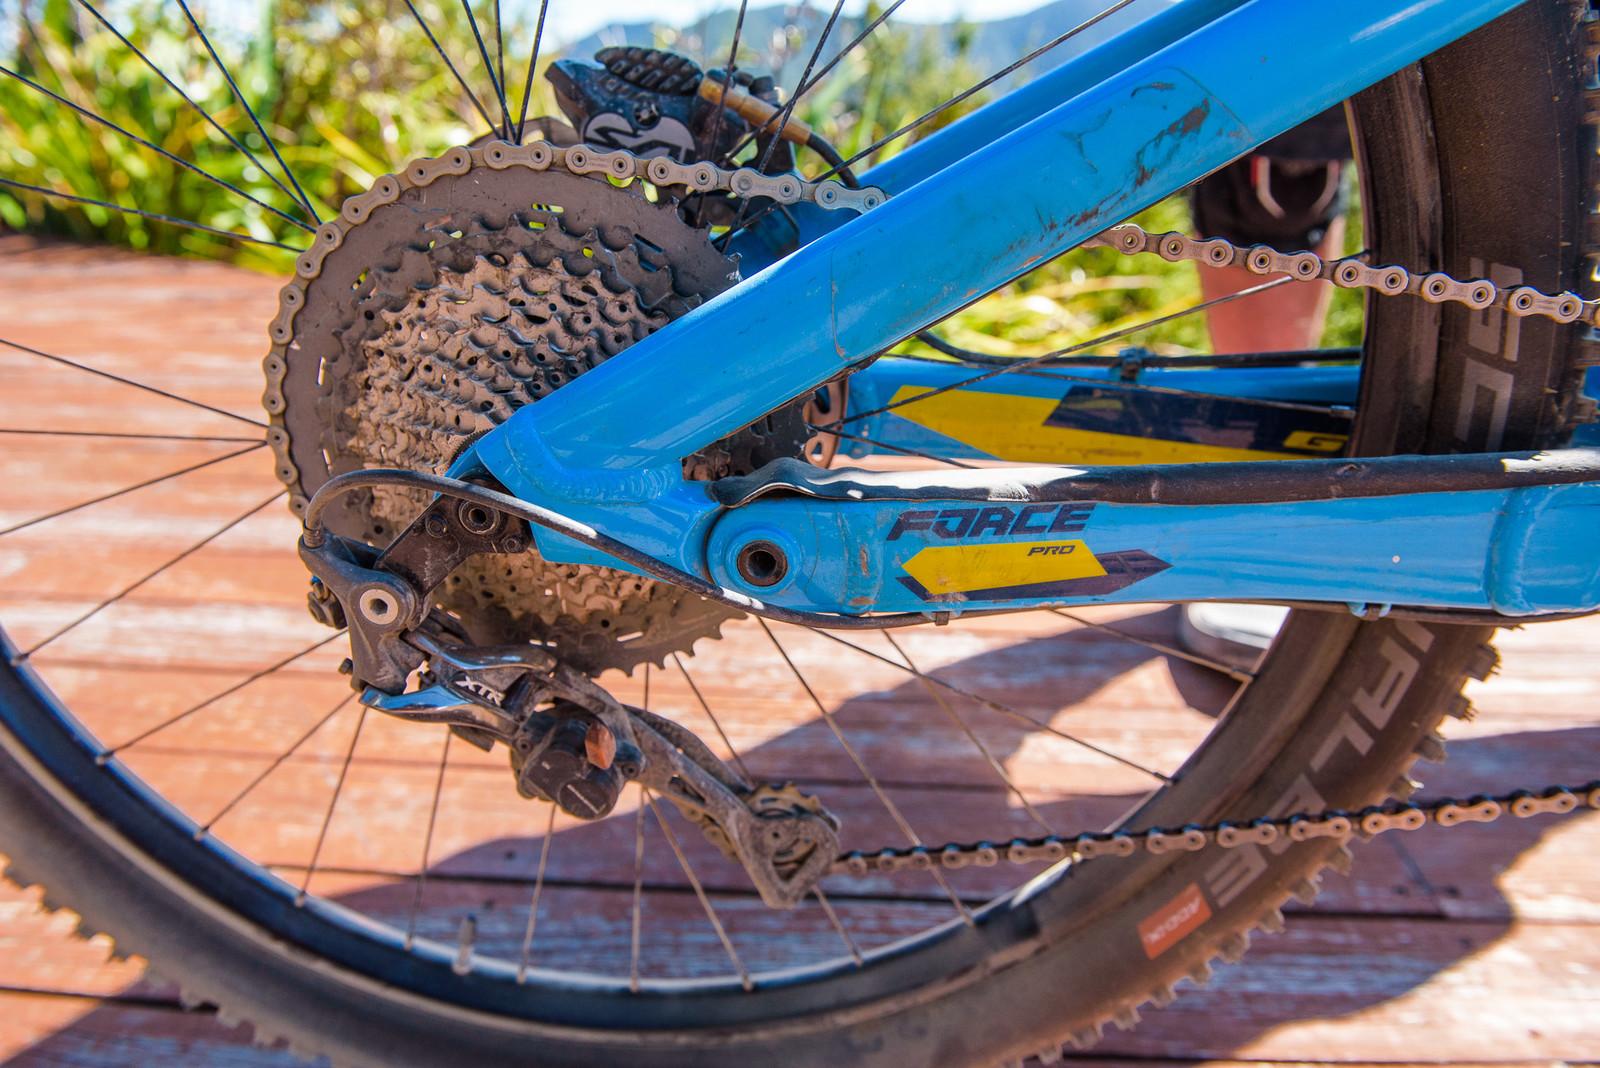 Shimano XTR Drivetrain - Pro Bike - Wyn Masters' GT Force, Size XL - Mountain Biking Pictures - Vital MTB